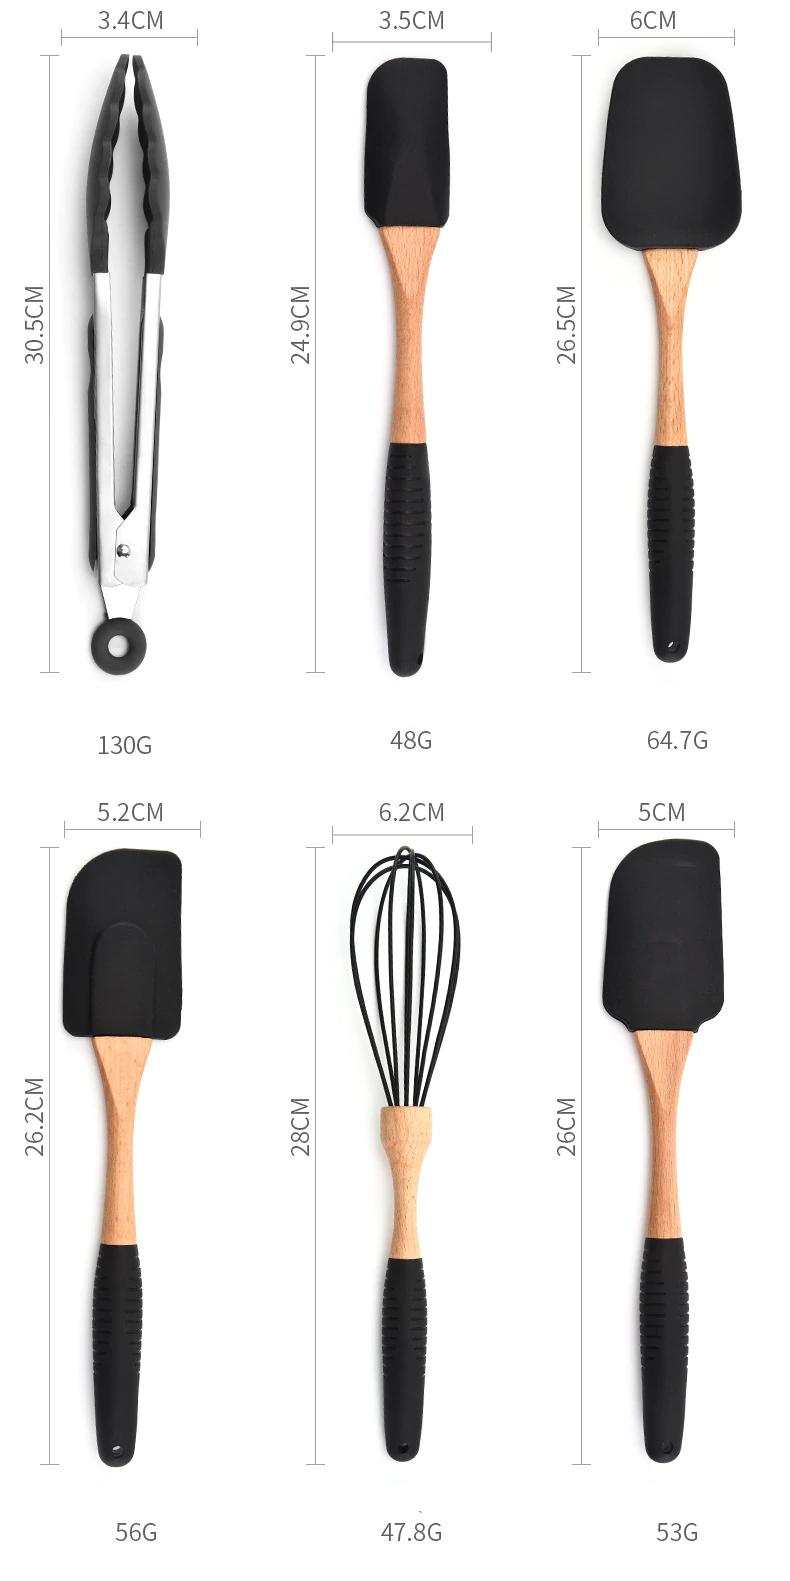 Wooden Handle Silicone Kitchenware Set